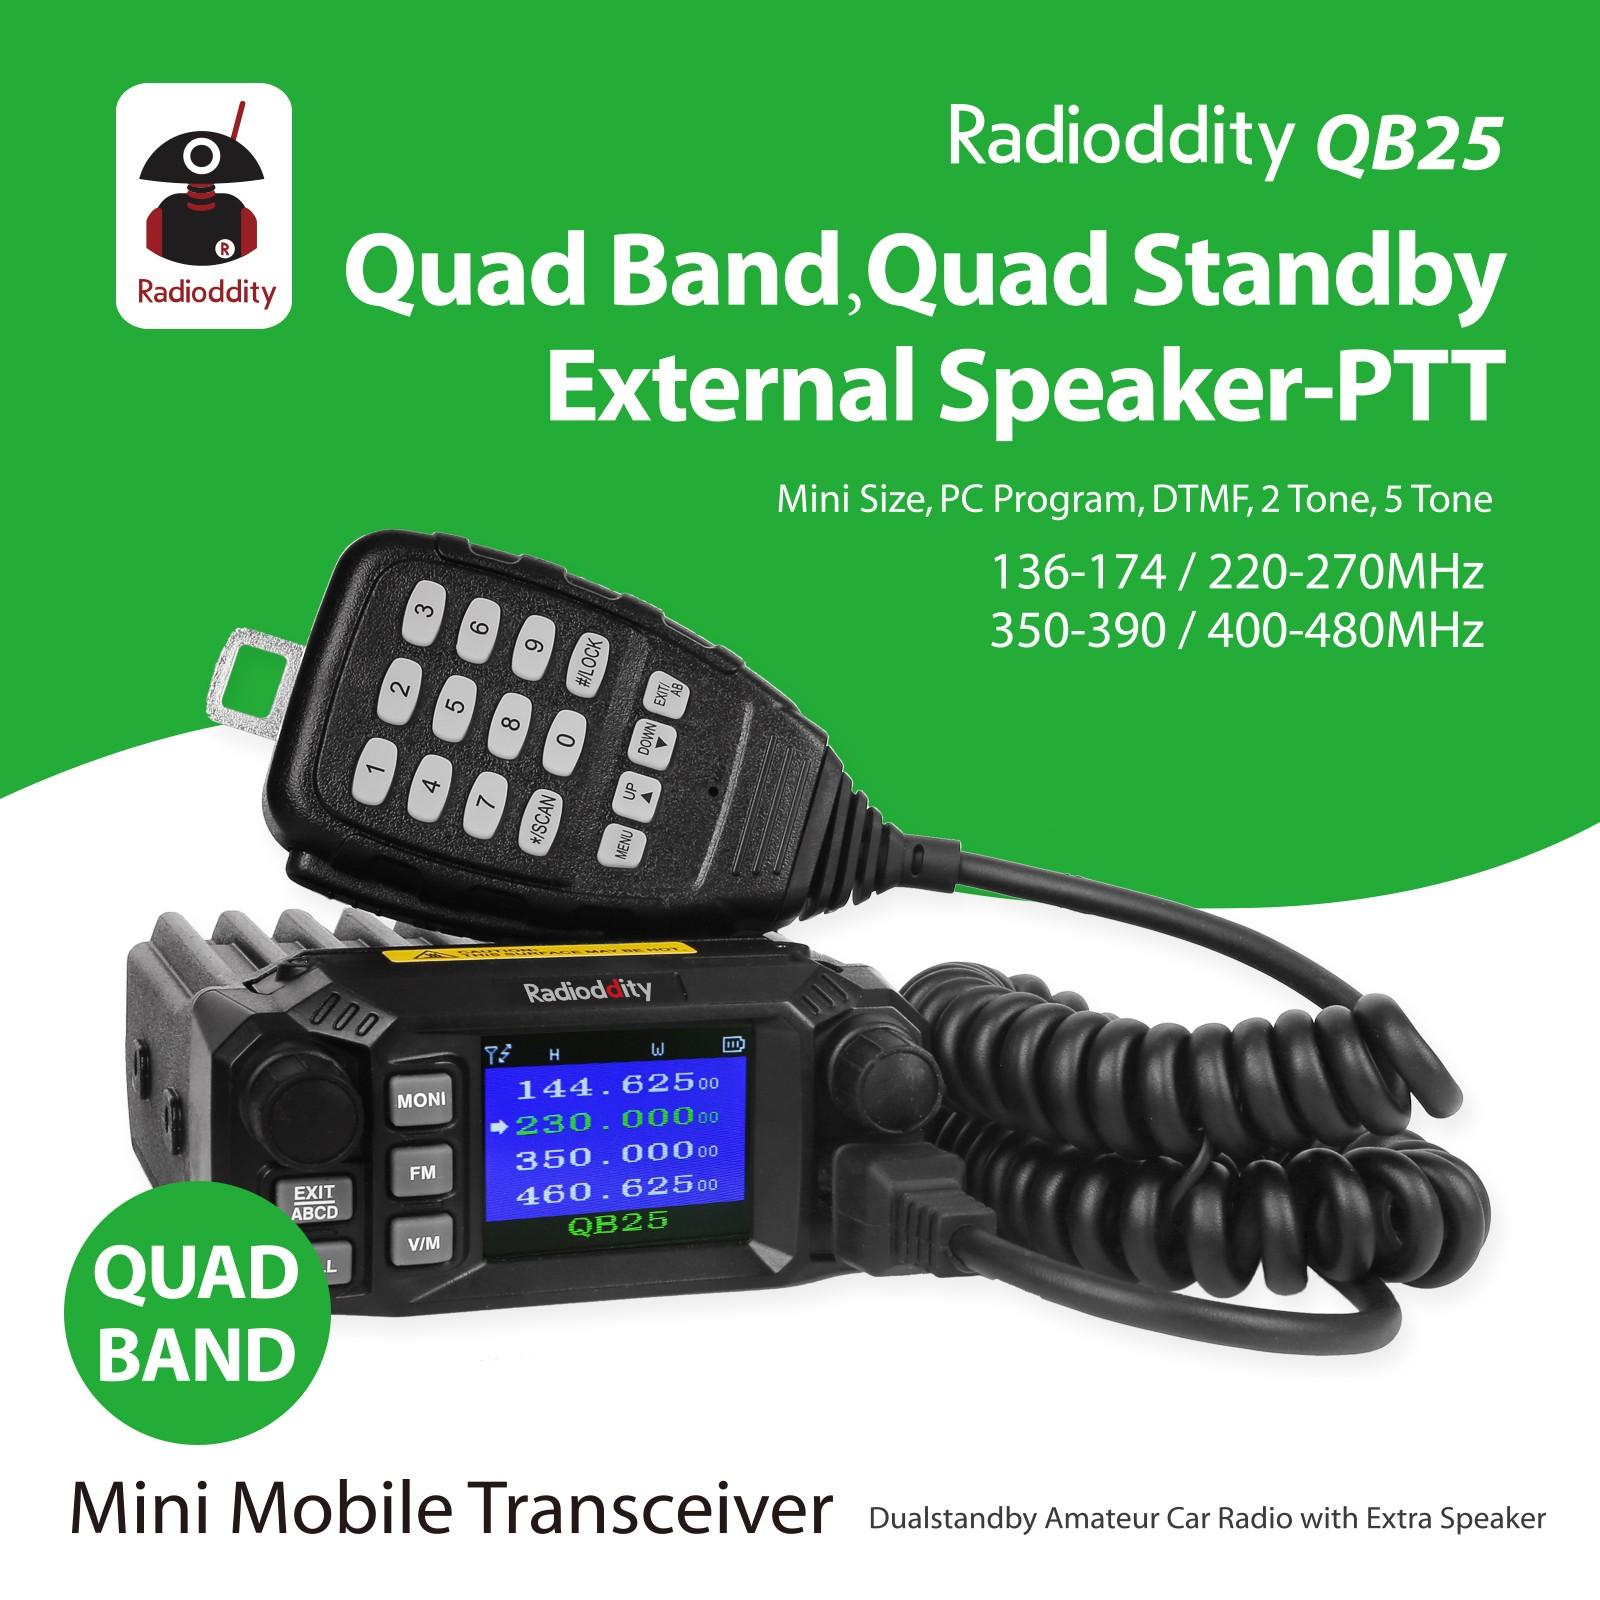 Radioddity QB25 Pro Quad Band Quad-standby Mini Mobile Car Truck Radio, VHF UHF 144/220/350/440 MHz+ Cable & CD + 50W High Gain Quad Band Antenna